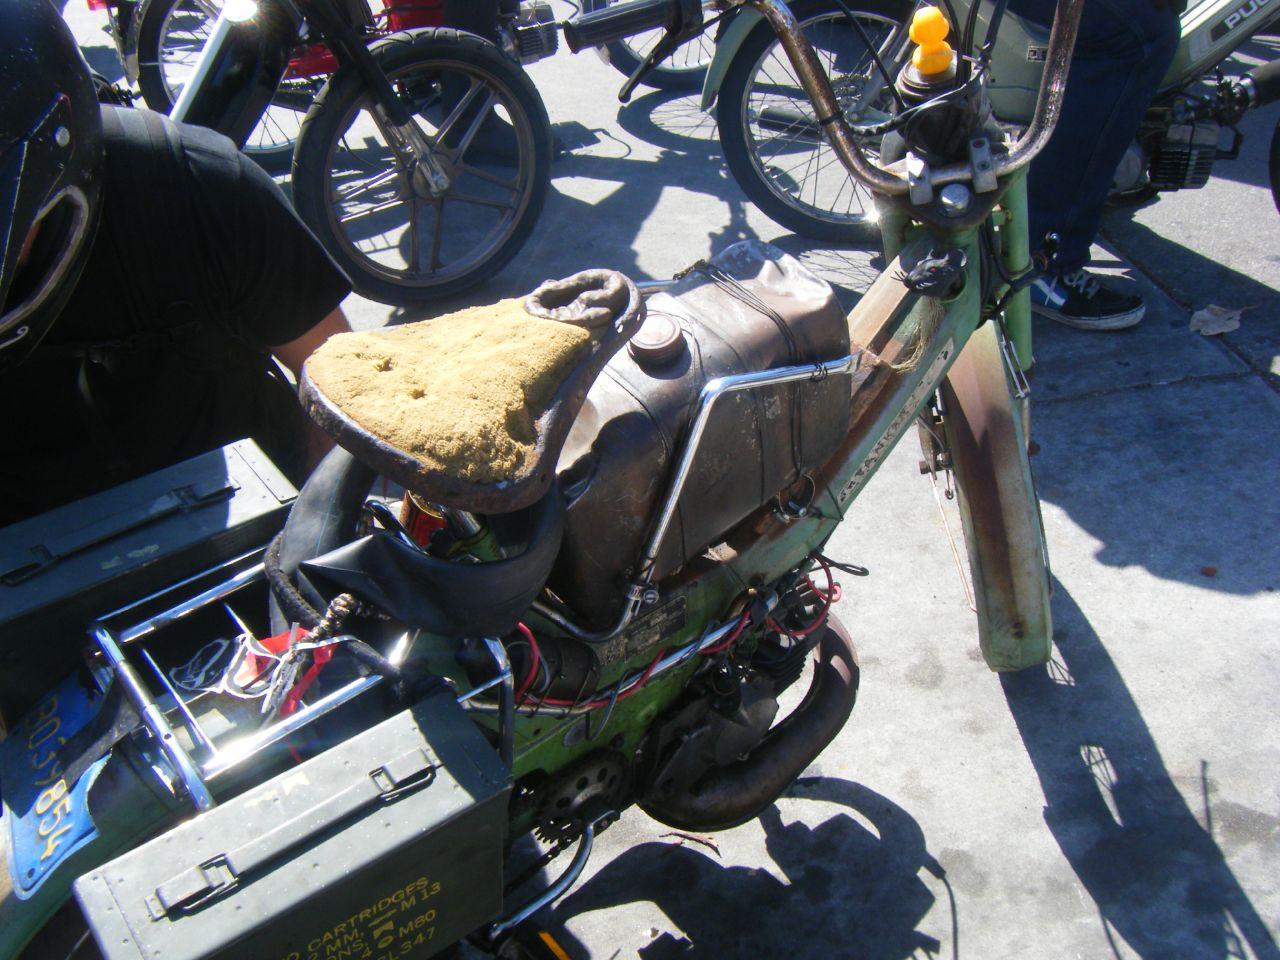 File:Peddy Cash (Moped Army) Rat Bike 01.jpg - Wikimedia Commons